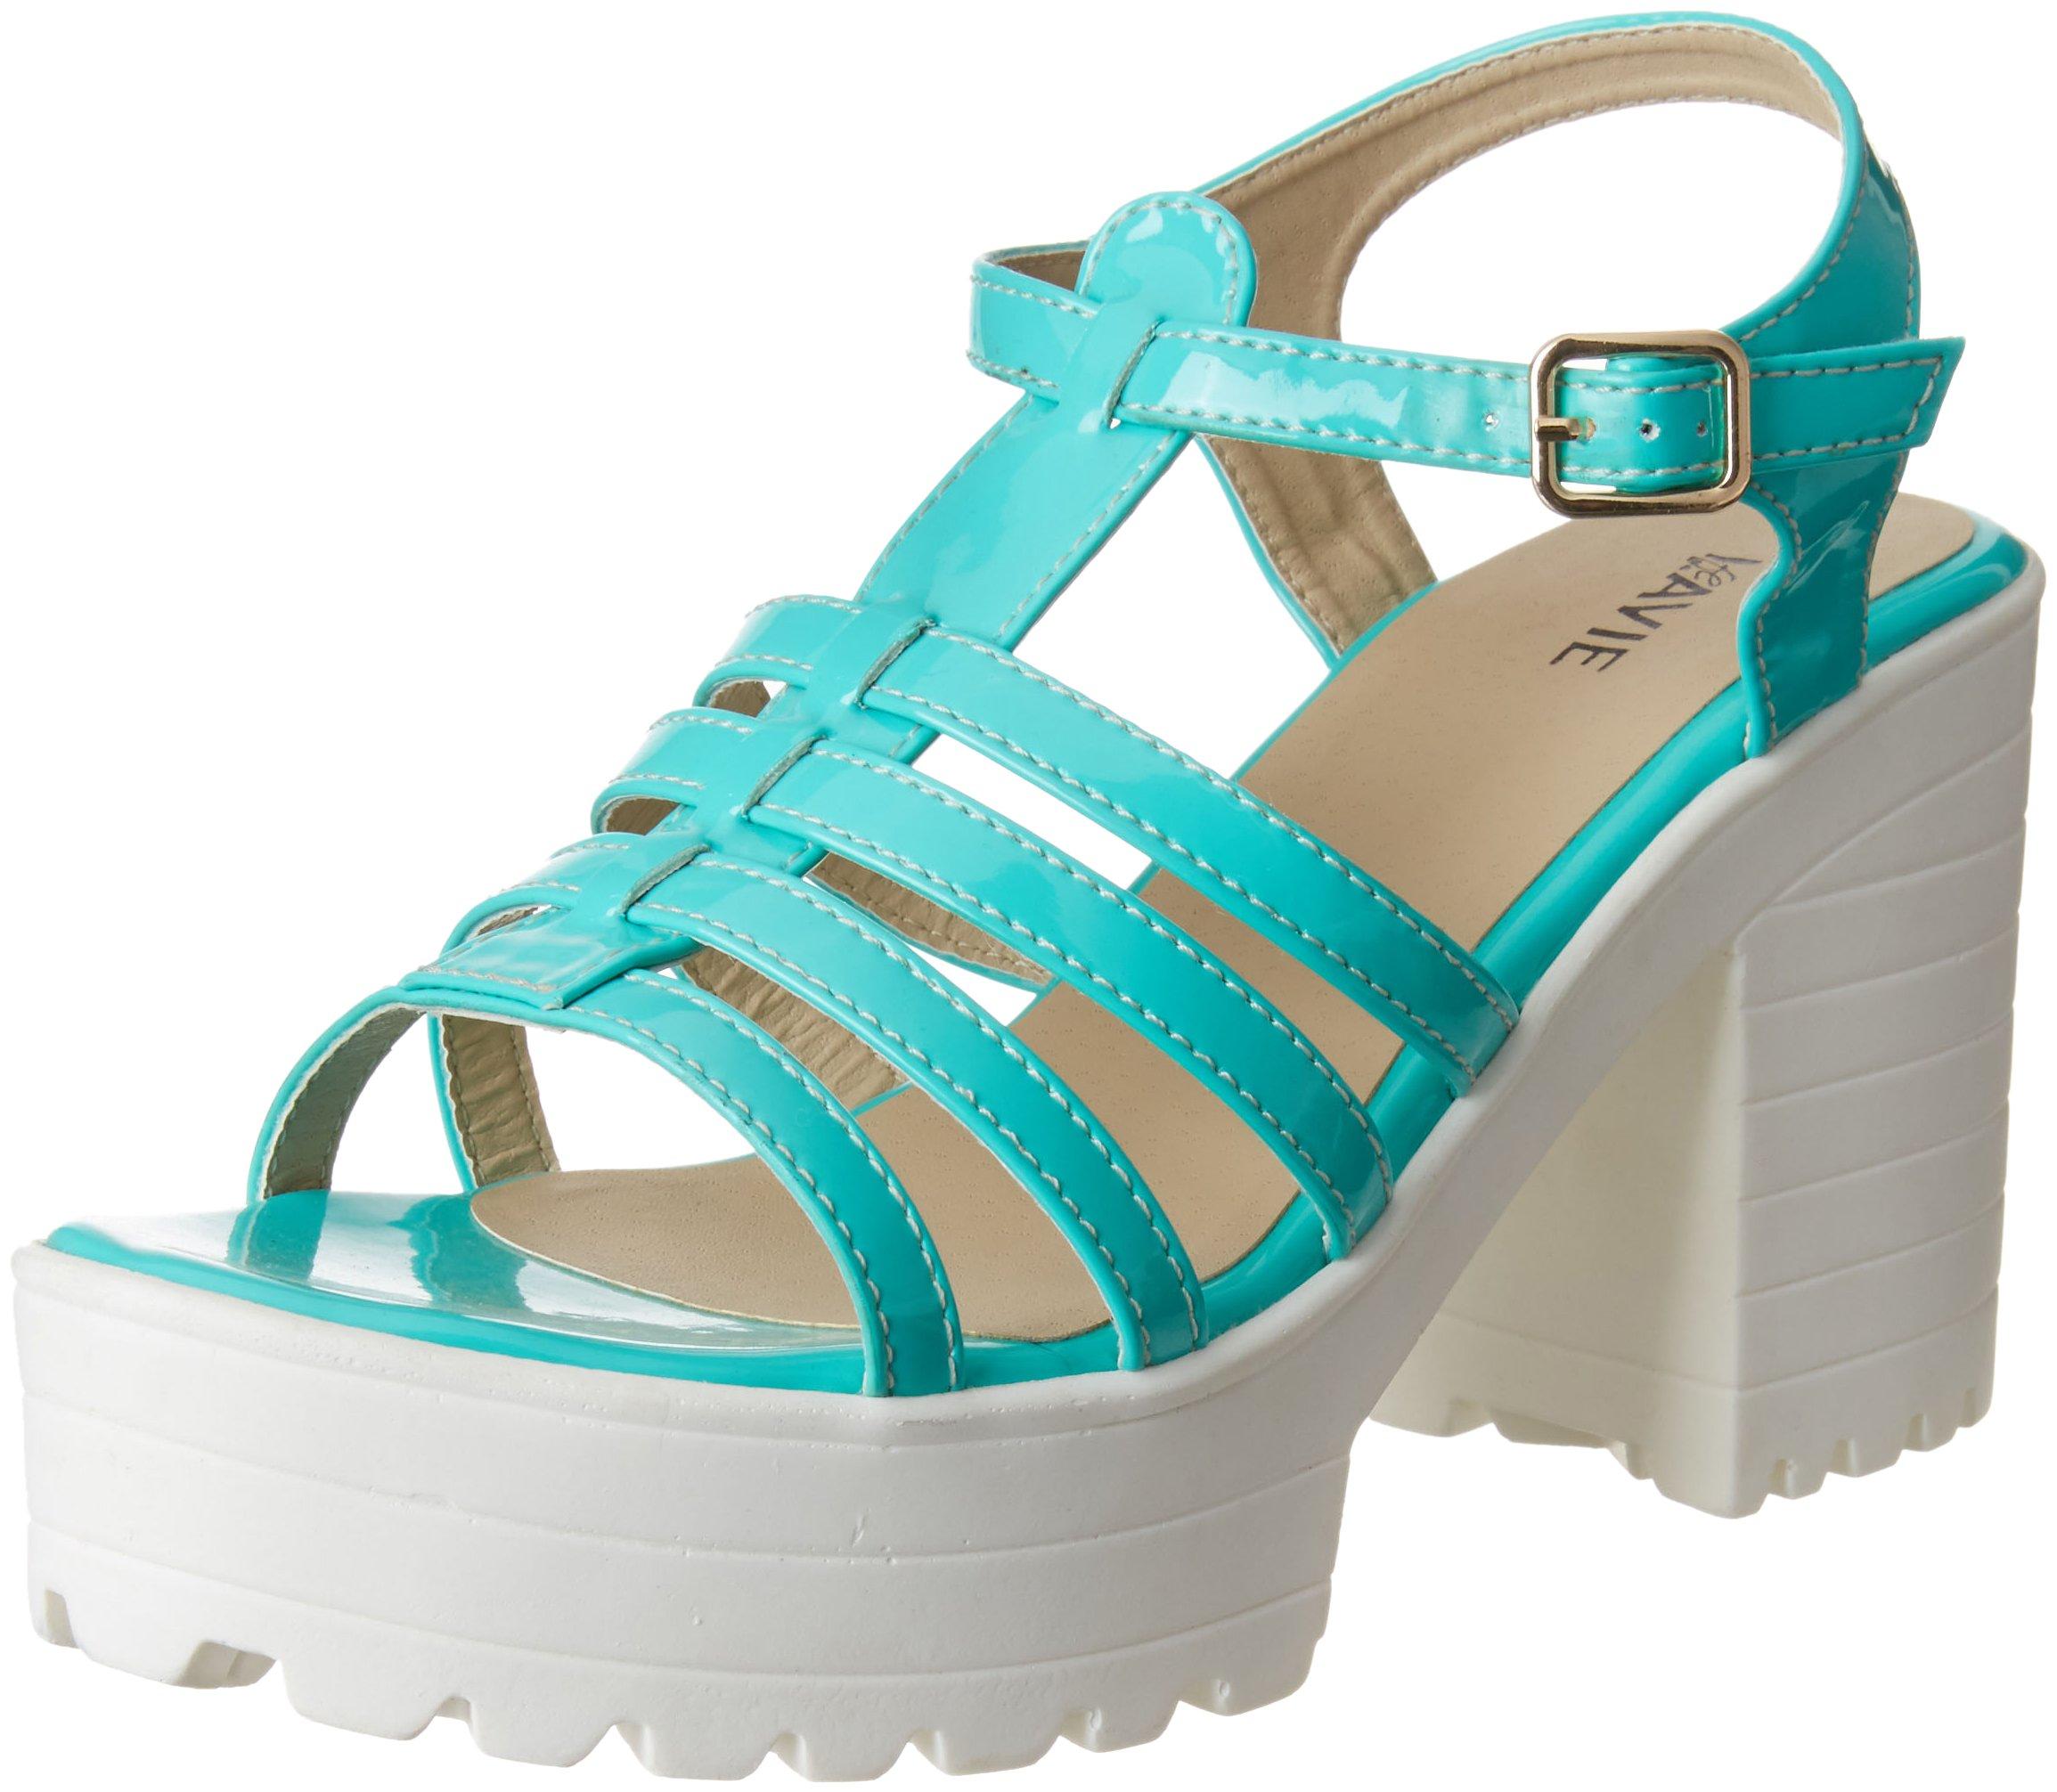 Lavie Women's Sling Back Fashion Sandals